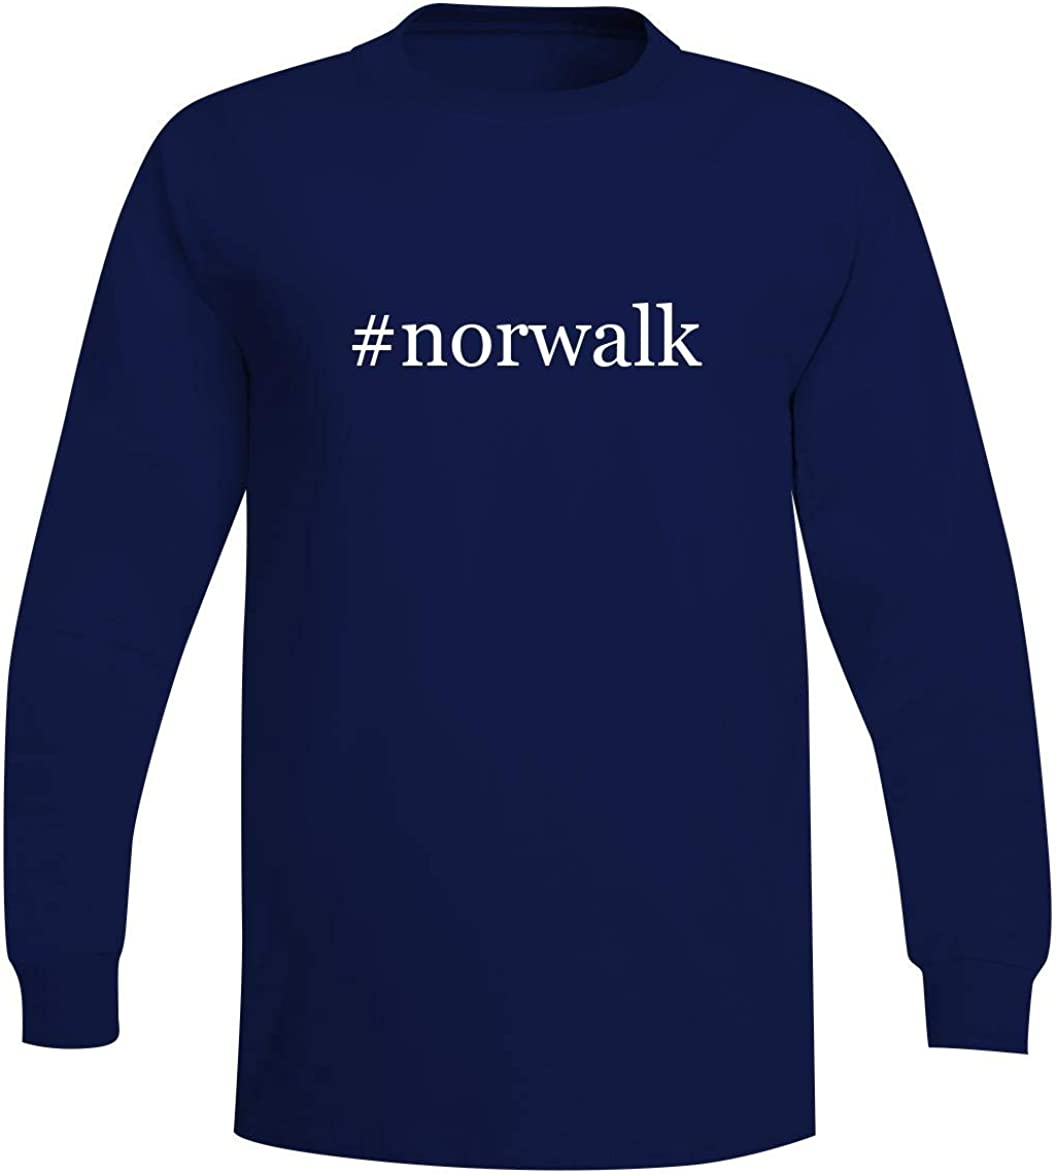 The Town Butler #Norwalk - A Soft & Comfortable Hashtag Men's Long Sleeve T-Shirt